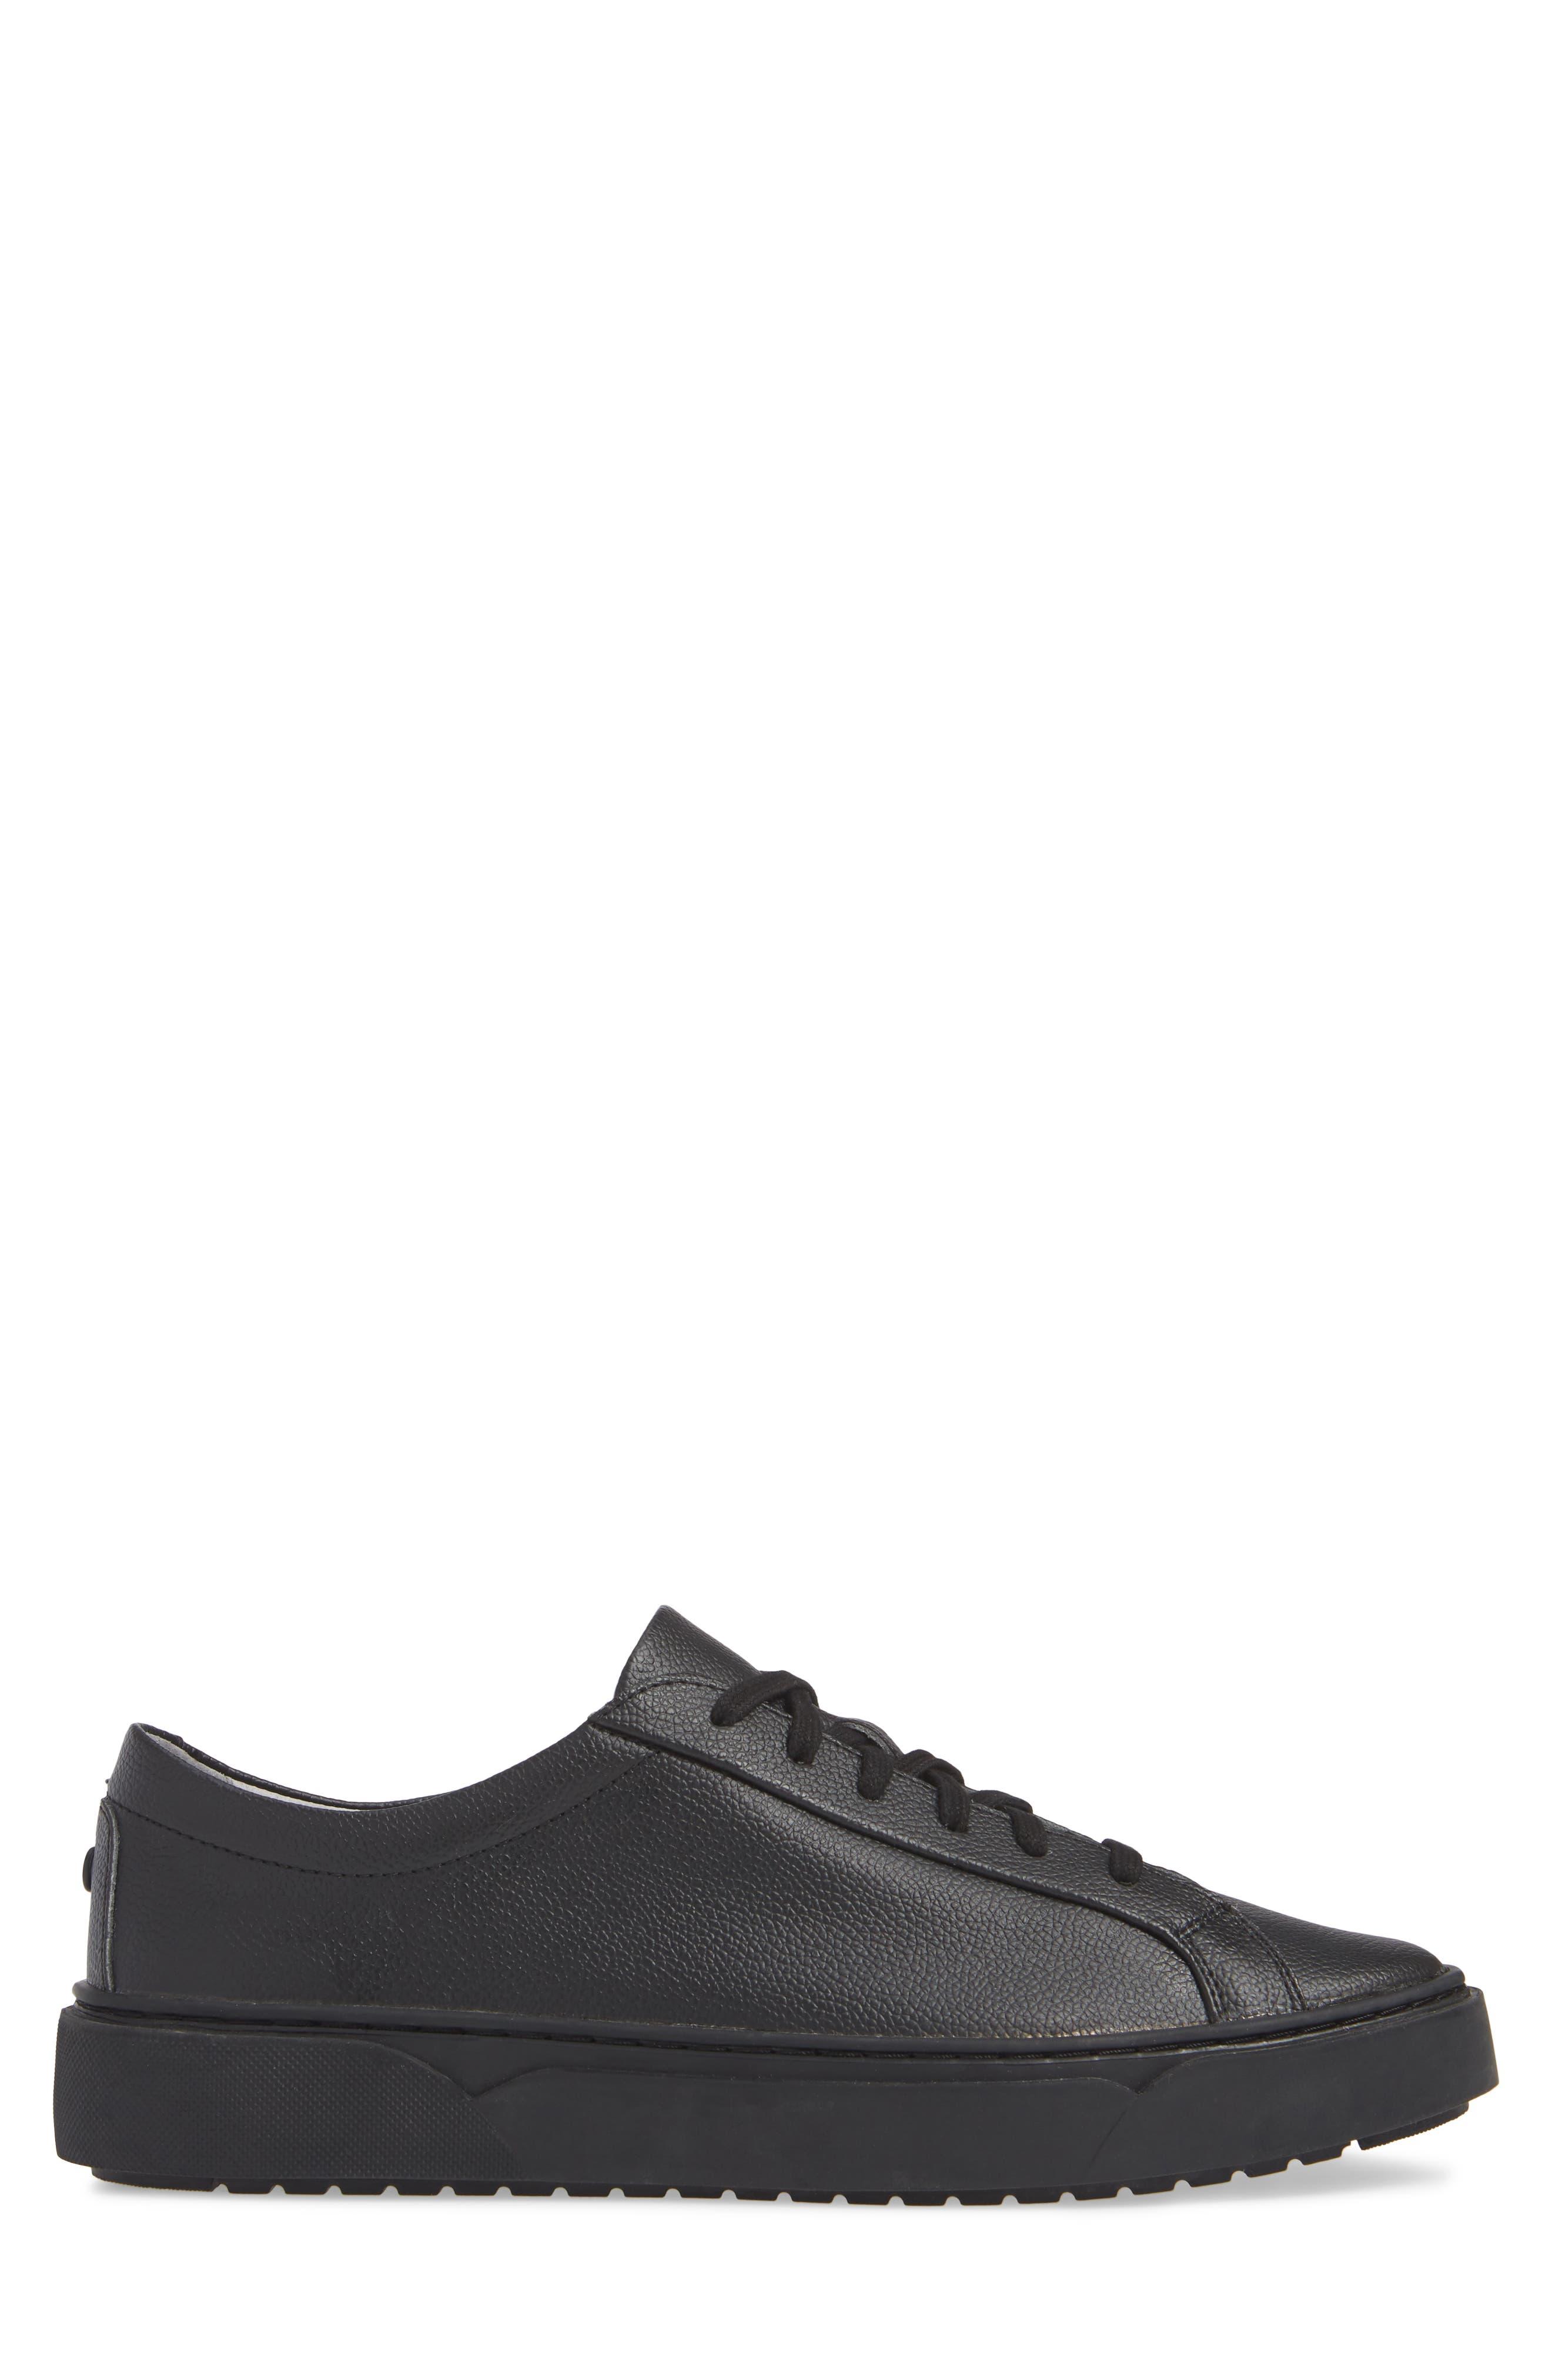 Ken Sneaker,                             Alternate thumbnail 3, color,                             TRIPLE BLACK LEATHER